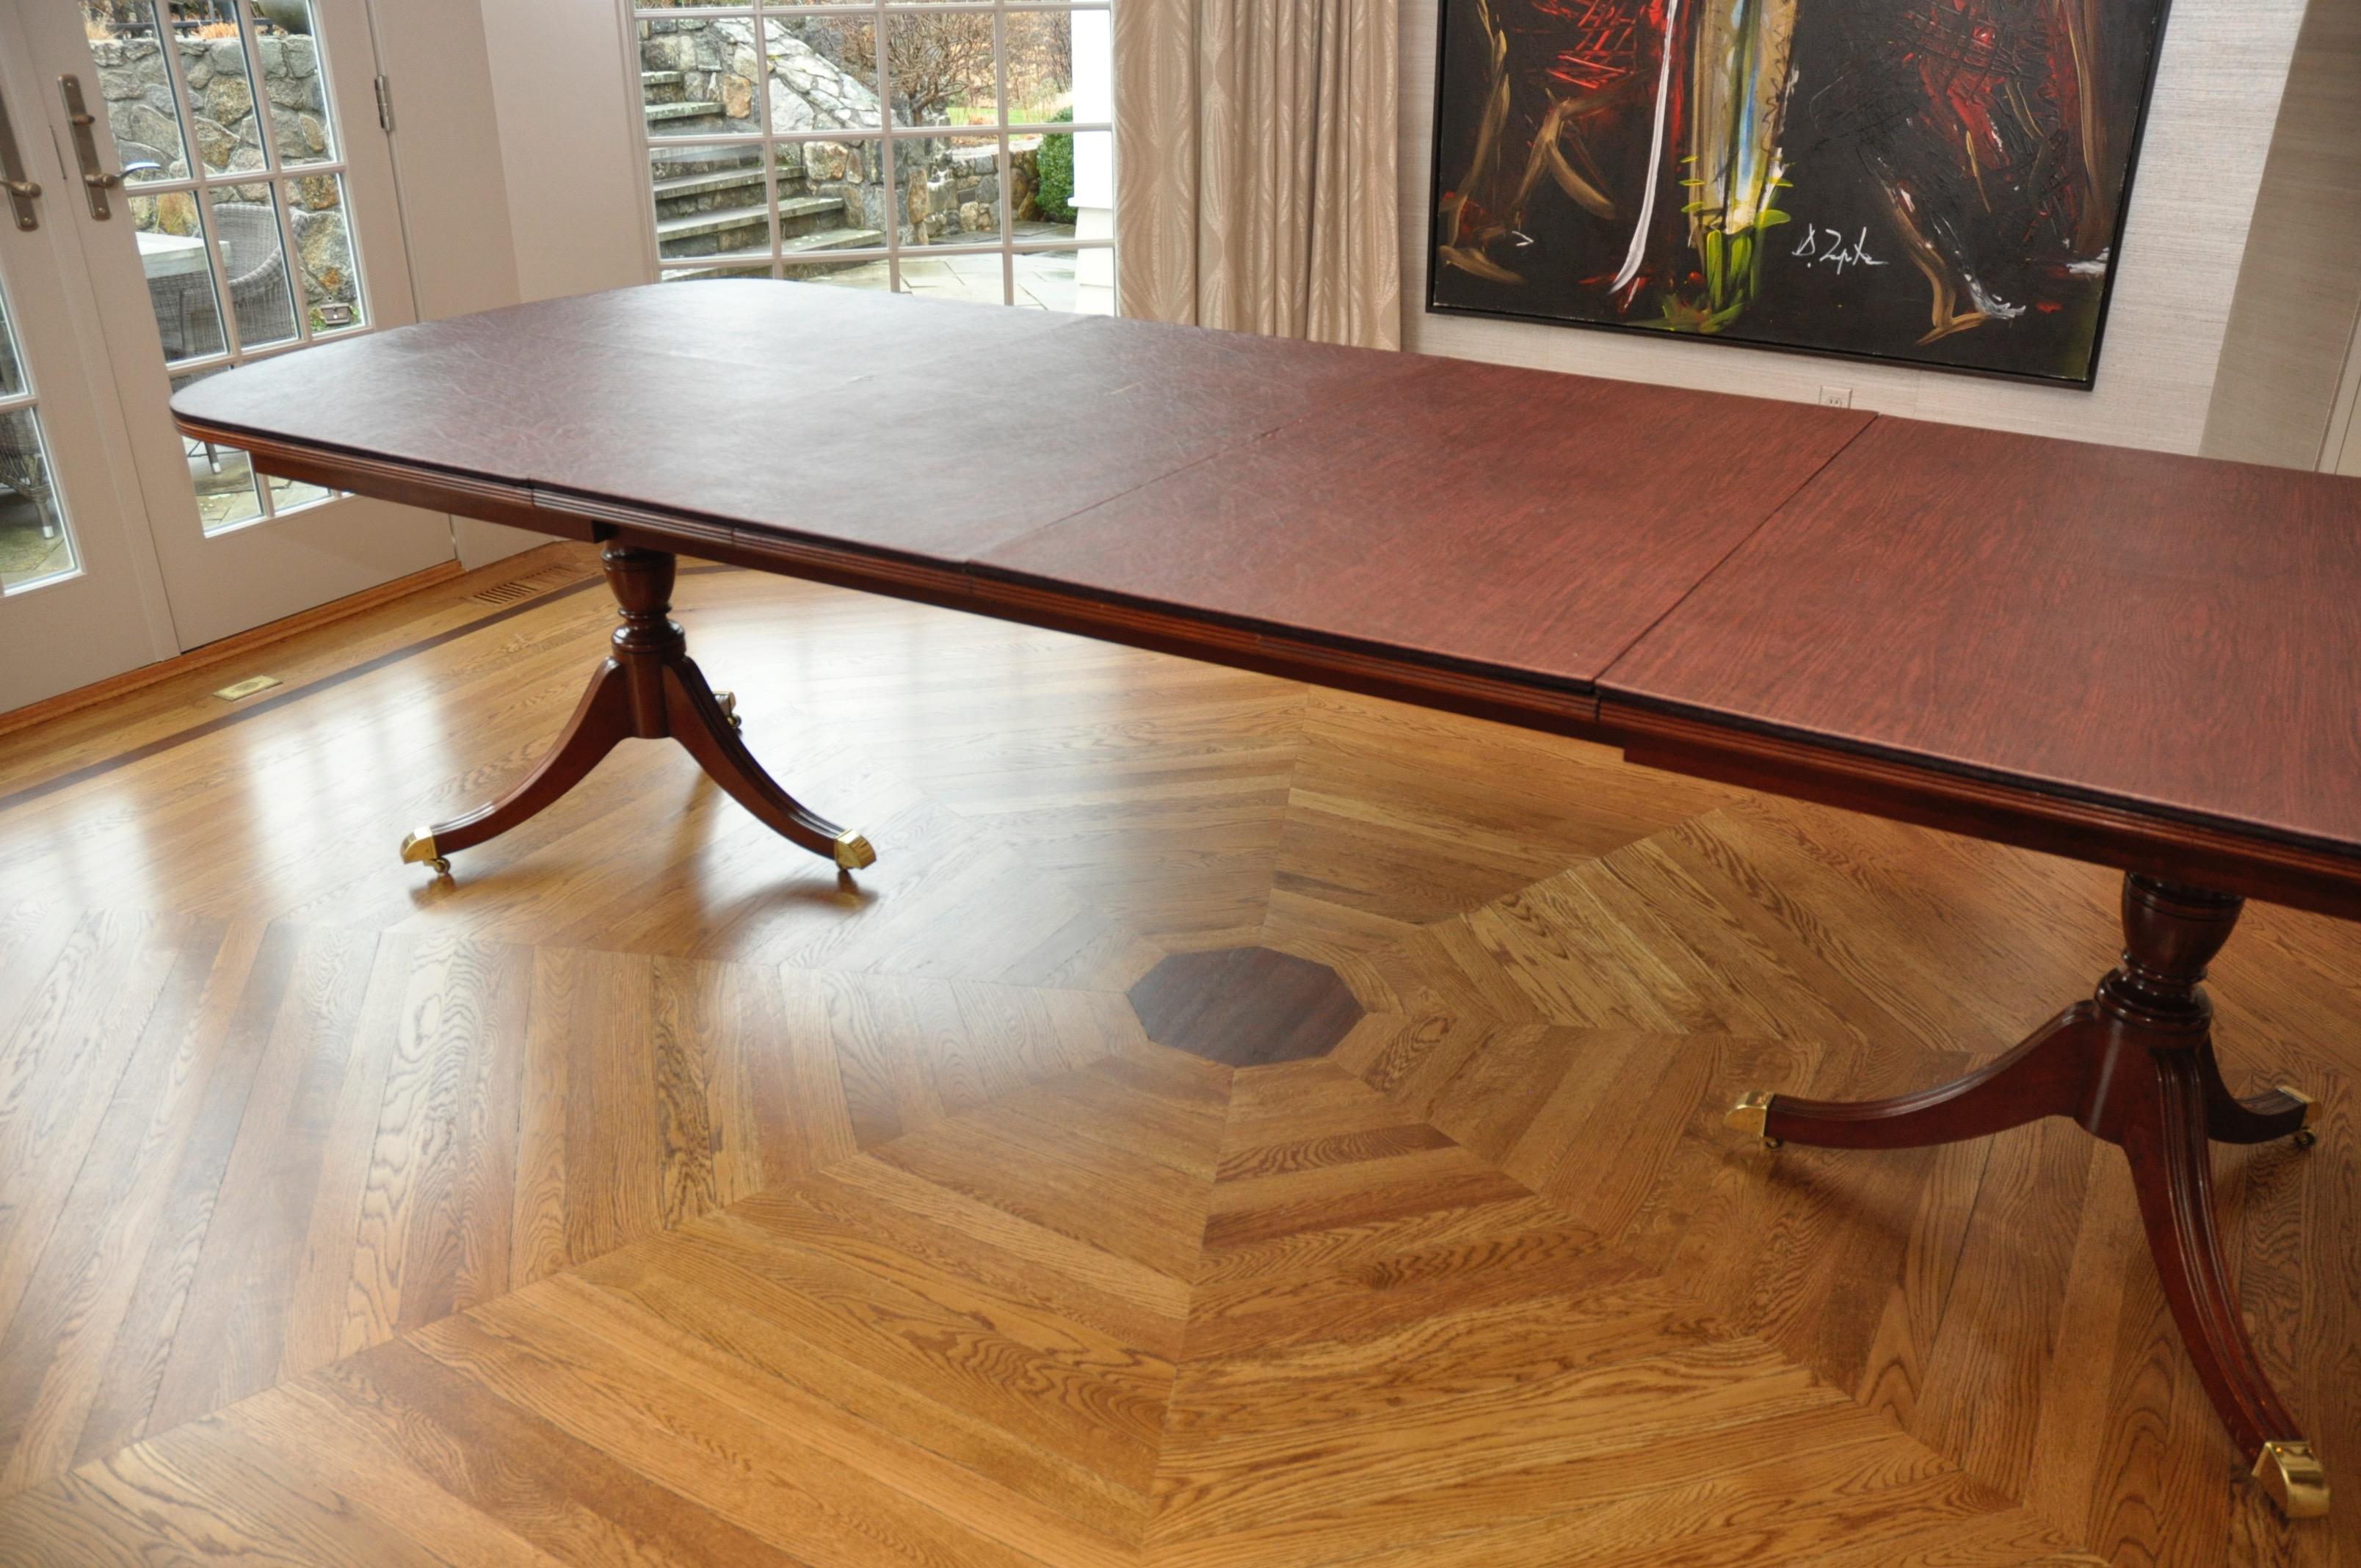 Kindel Crotch Mahogany Pedestal Dining Table Chairish : kindel crotch mahogany pedestal dining table 6364aspectfitampwidth640ampheight640 from www.chairish.com size 640 x 640 jpeg 49kB